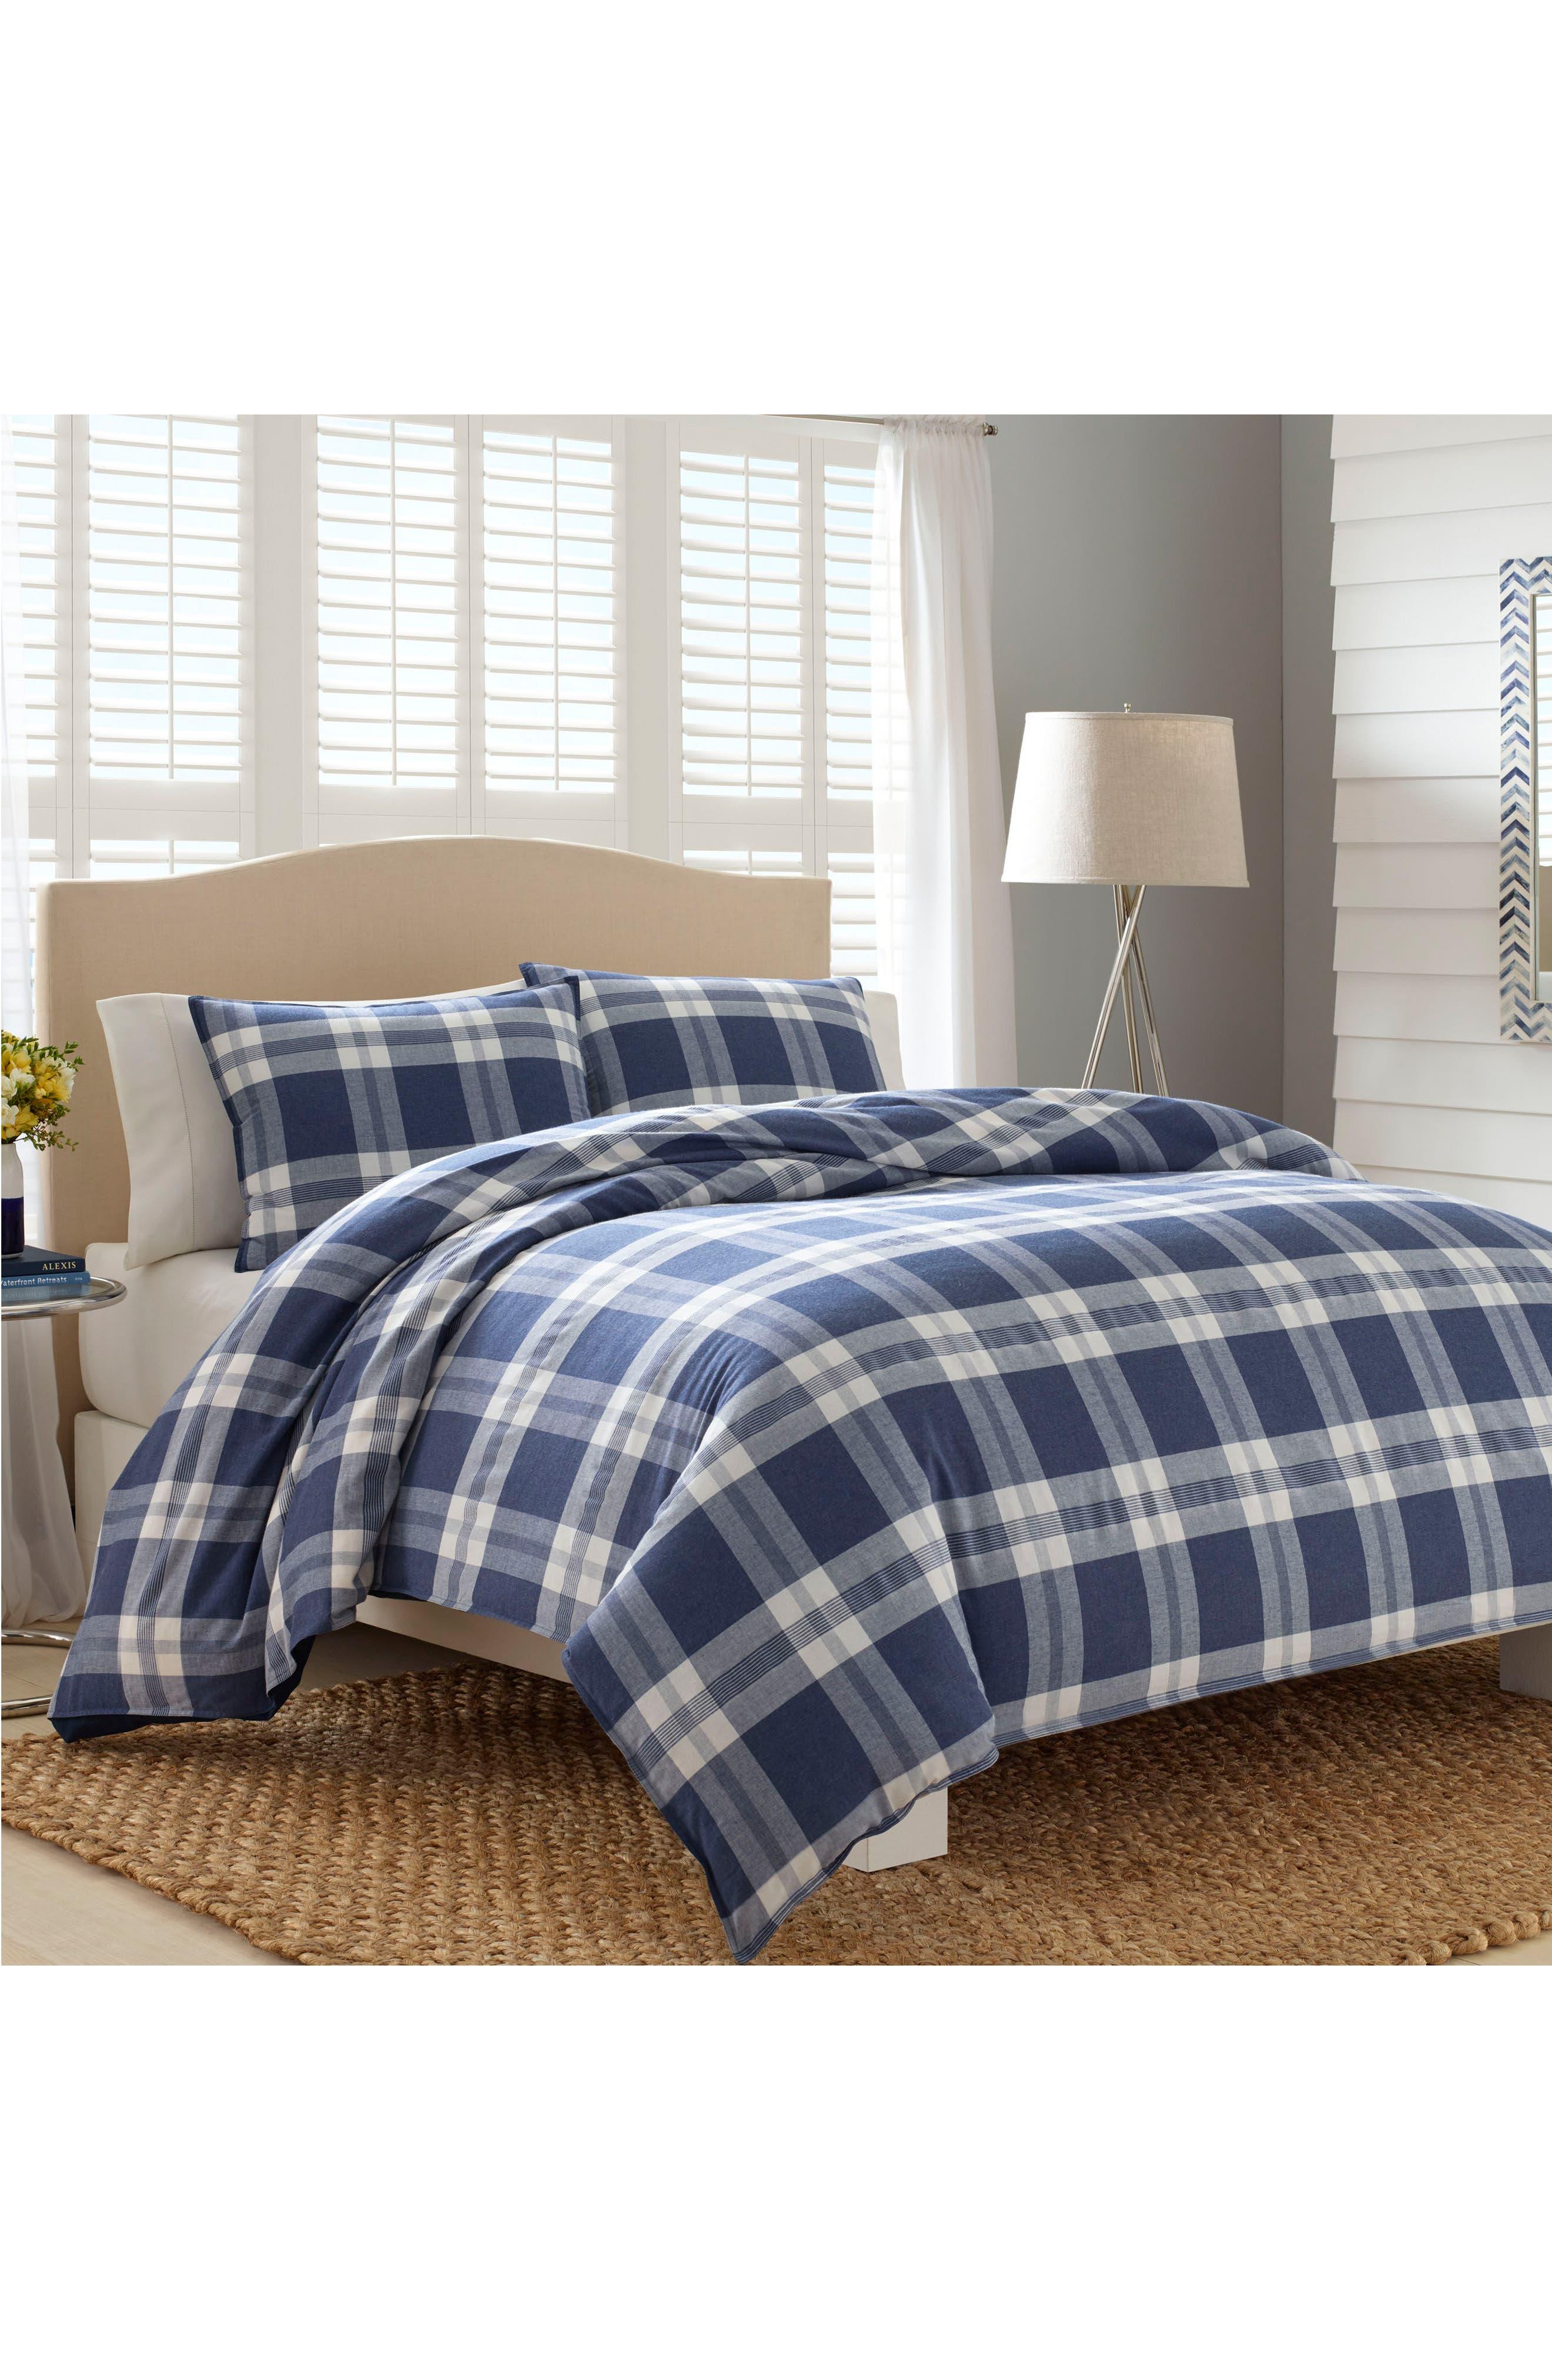 Cunningham Comforter & Sham Set,                             Main thumbnail 1, color,                             425